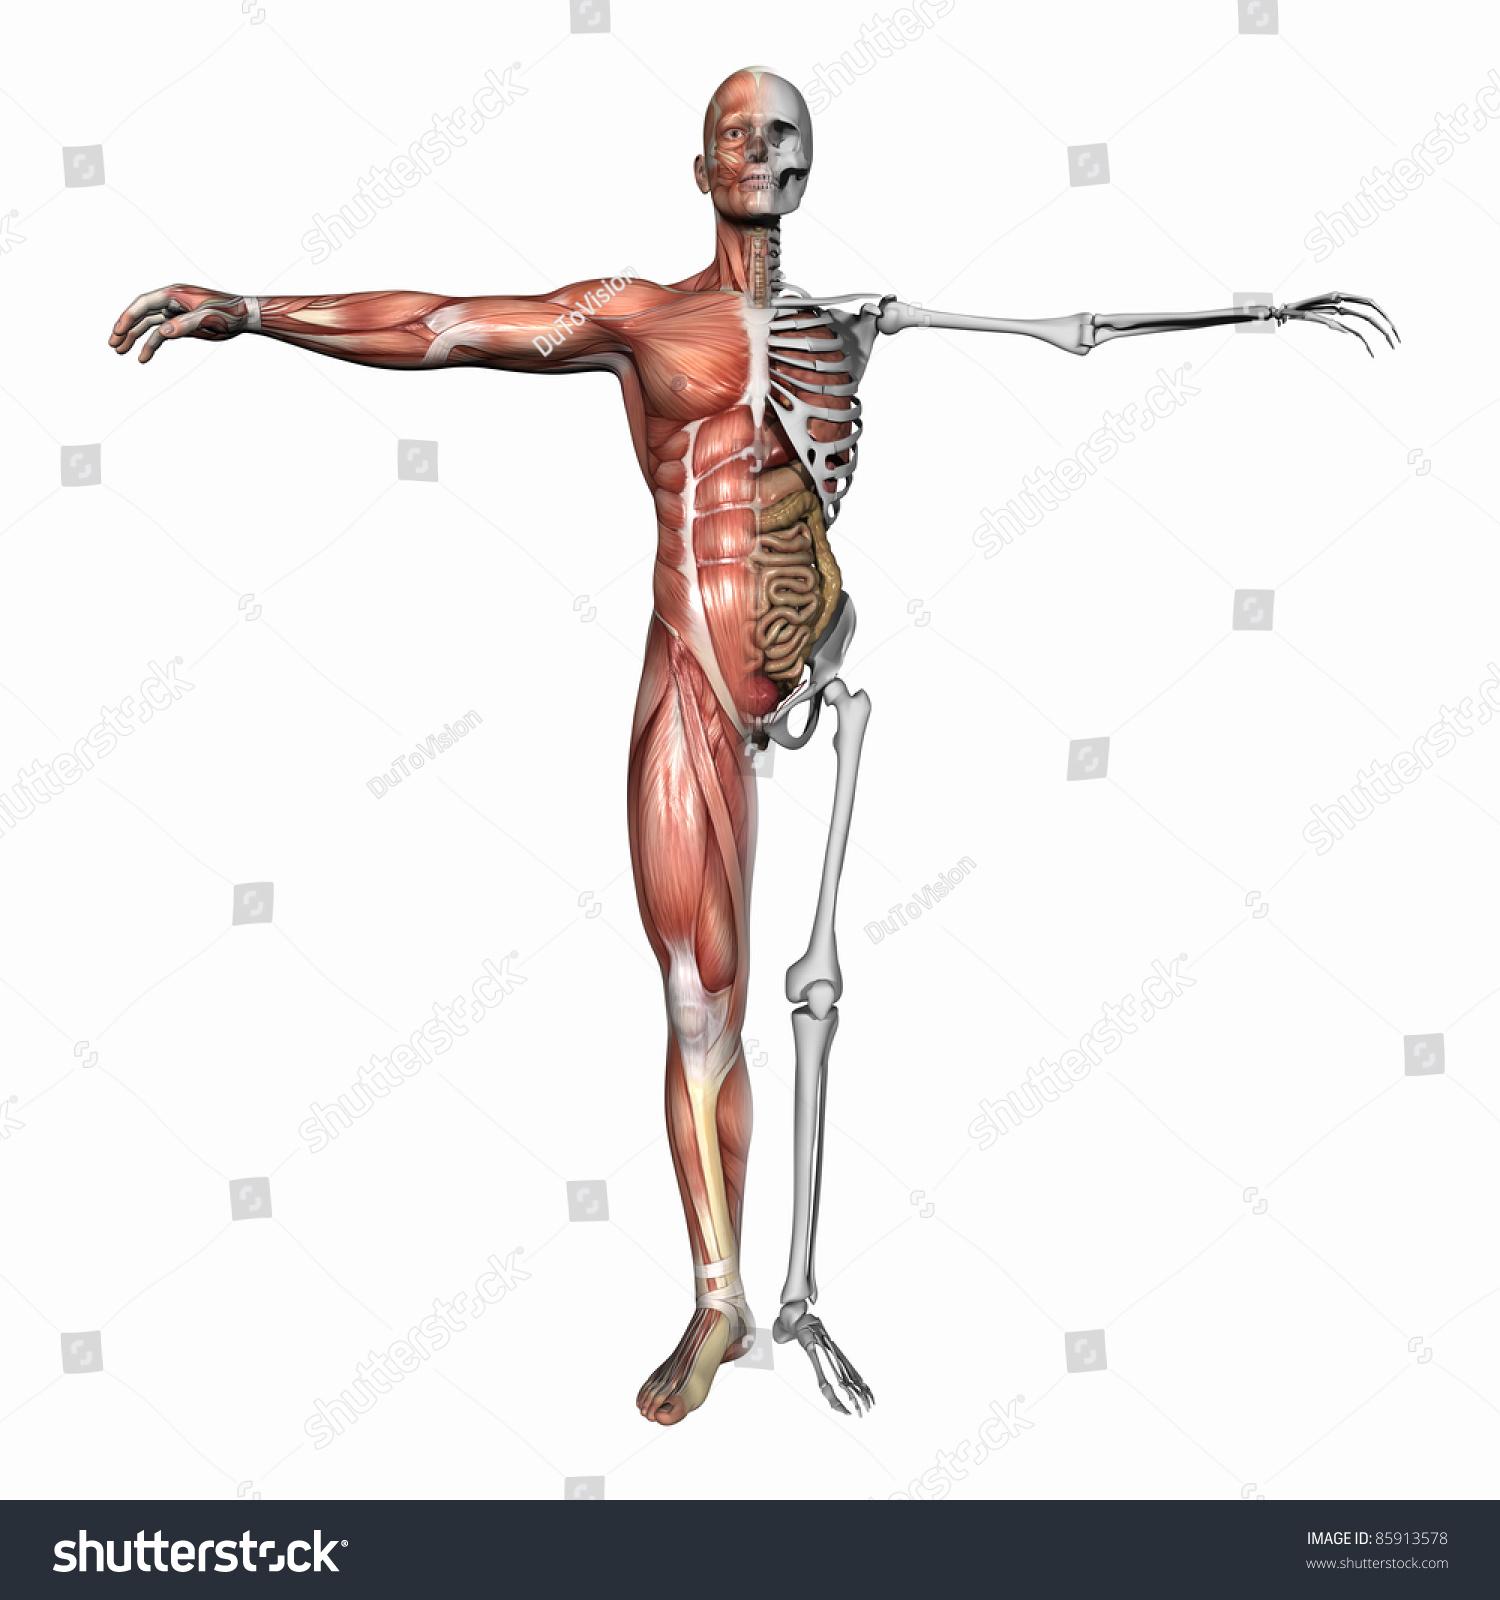 high resolution 3d illustration human skeleton stock illustration, Skeleton